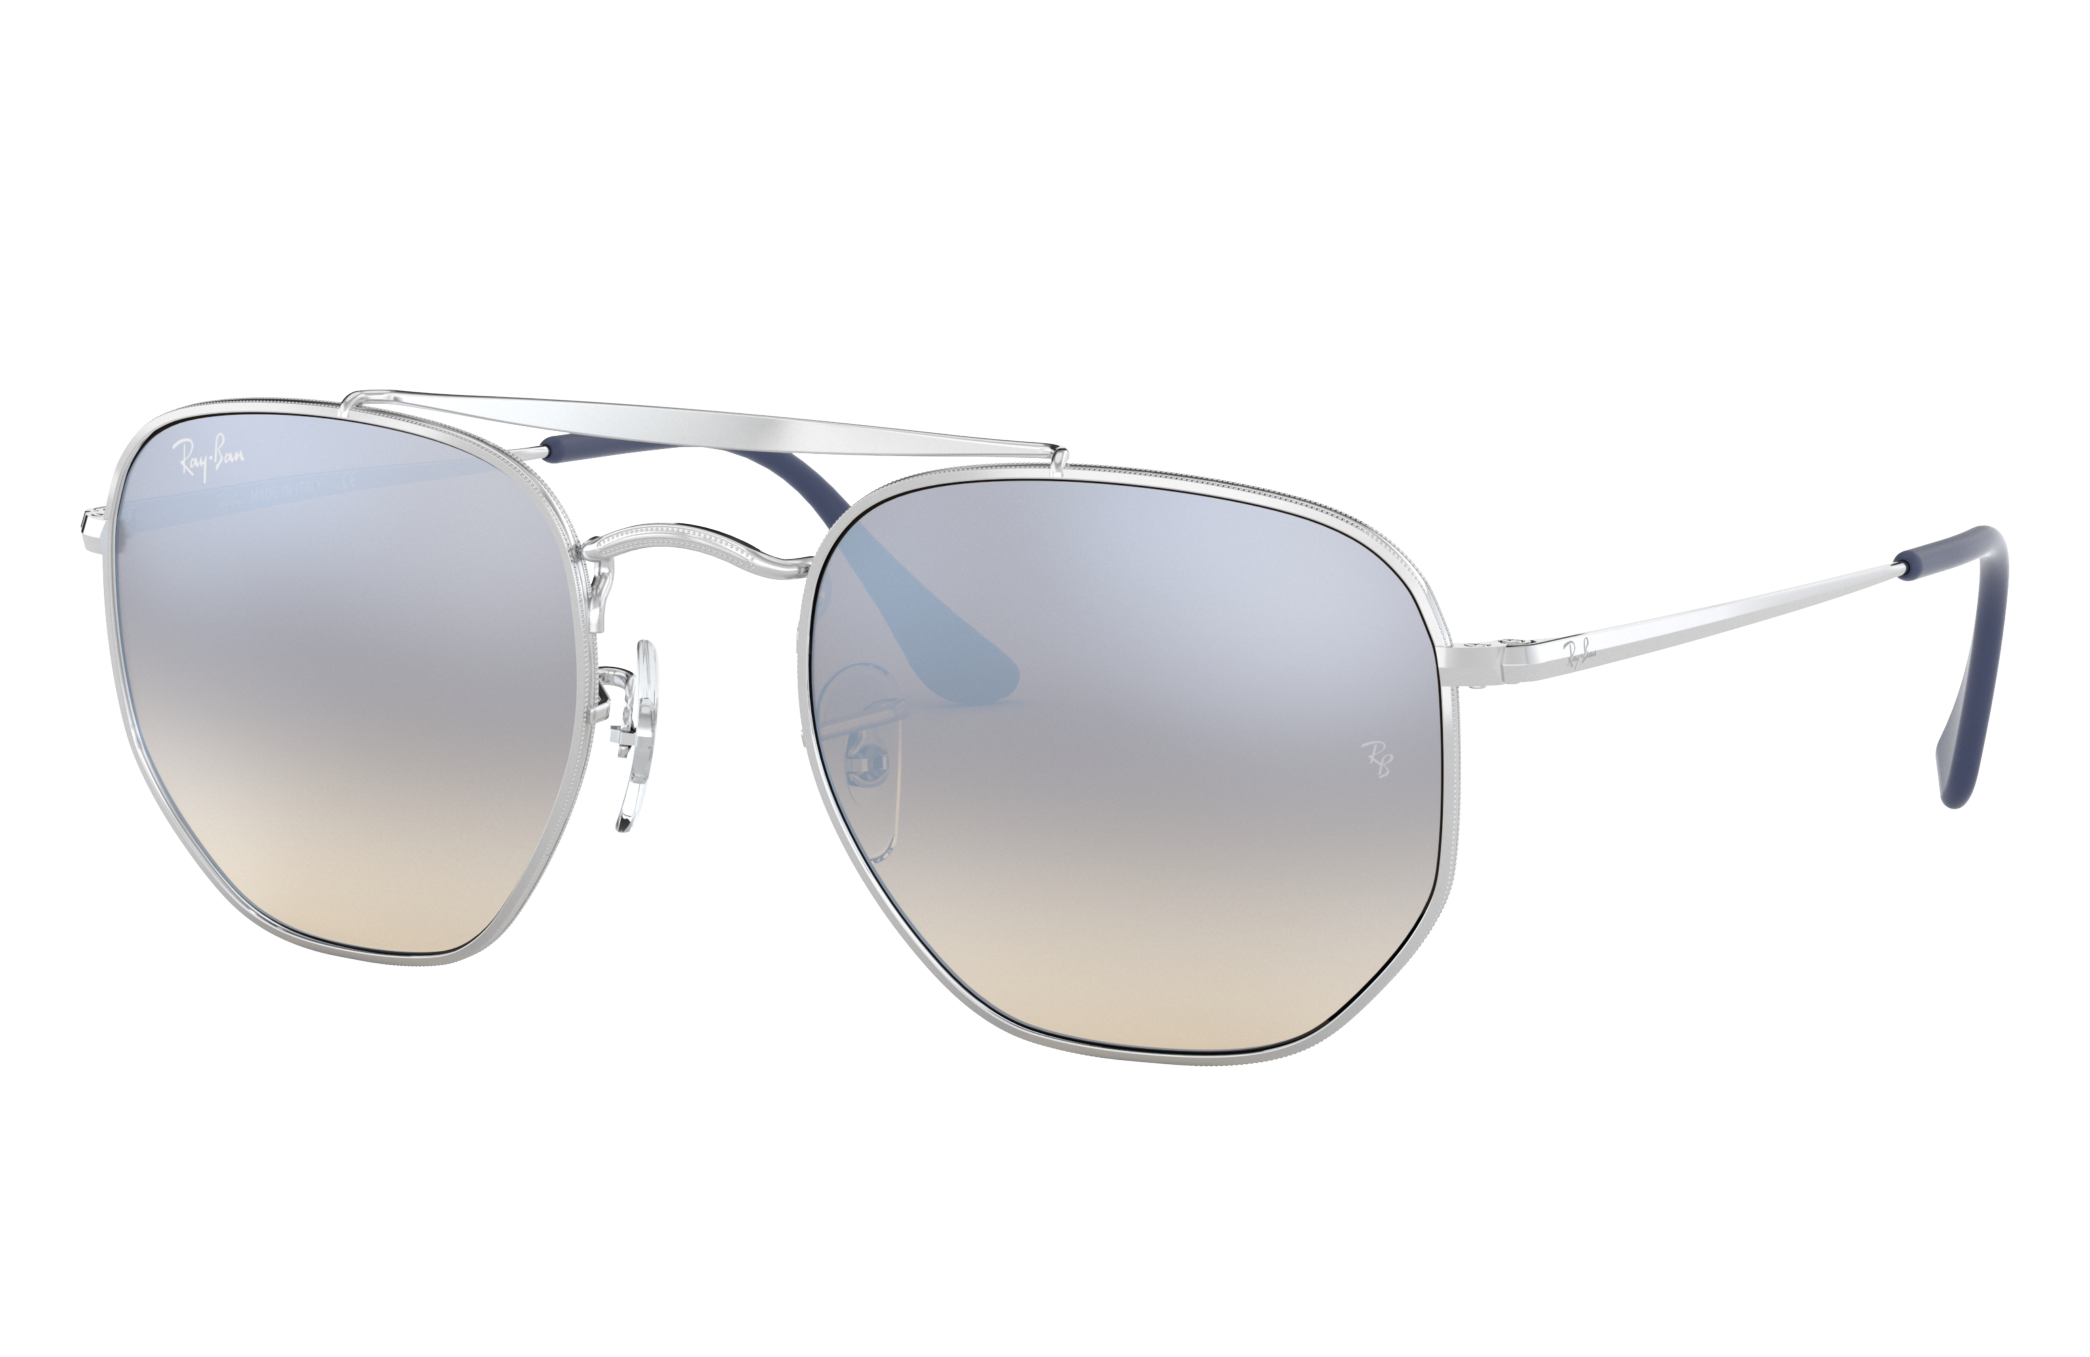 Ray-Ban Marshal Silver, Gray Lenses - RB3648